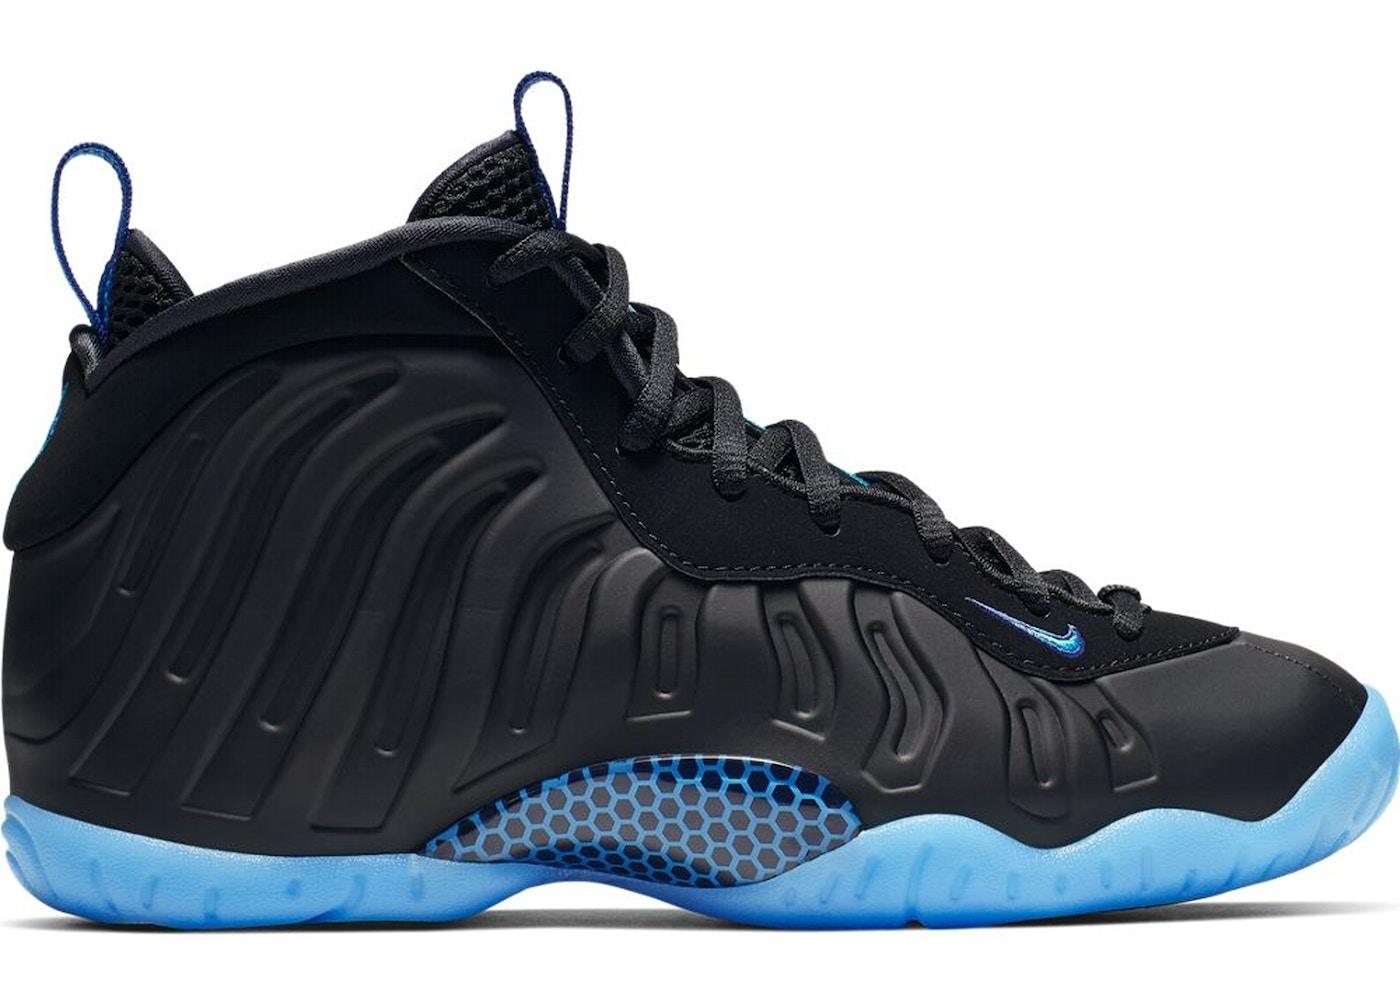 f4e86f0f890a5 Nike Foamposite Shoes - Release Date